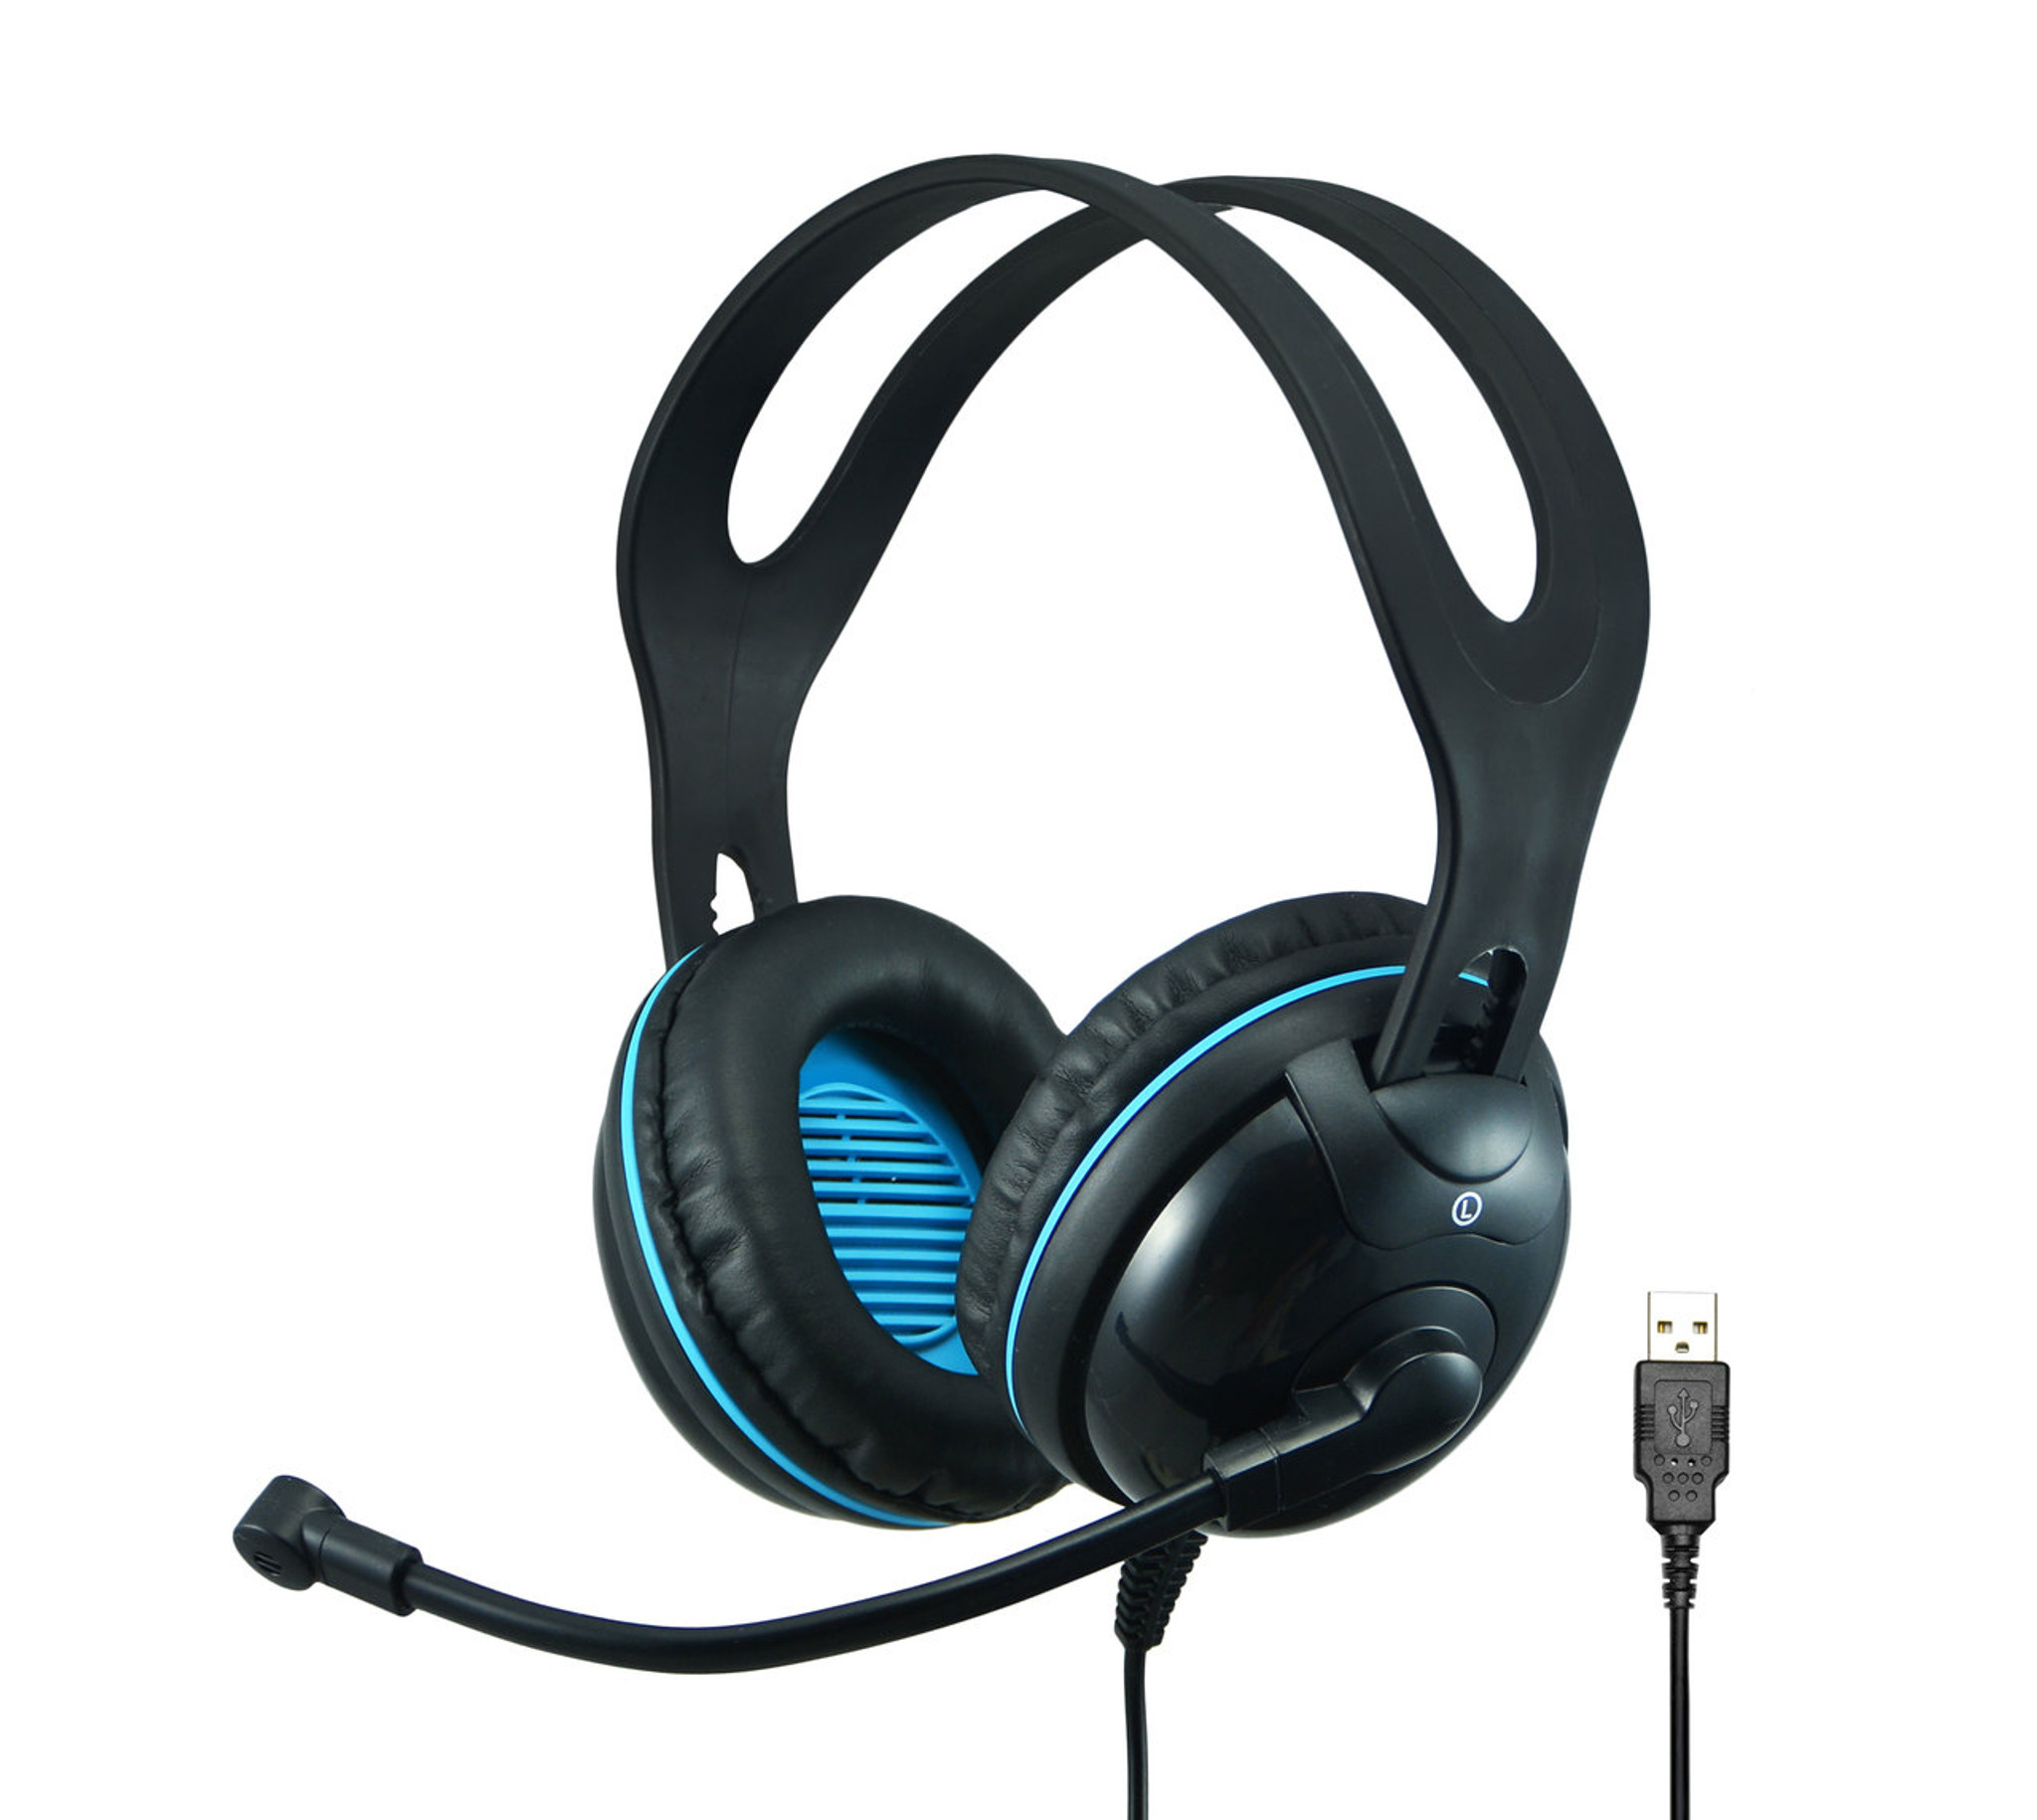 94b737dbe1e EDU-455 USB Over-Ear Stereo USB Headset (List Price $44.95) - Andrea  Communications